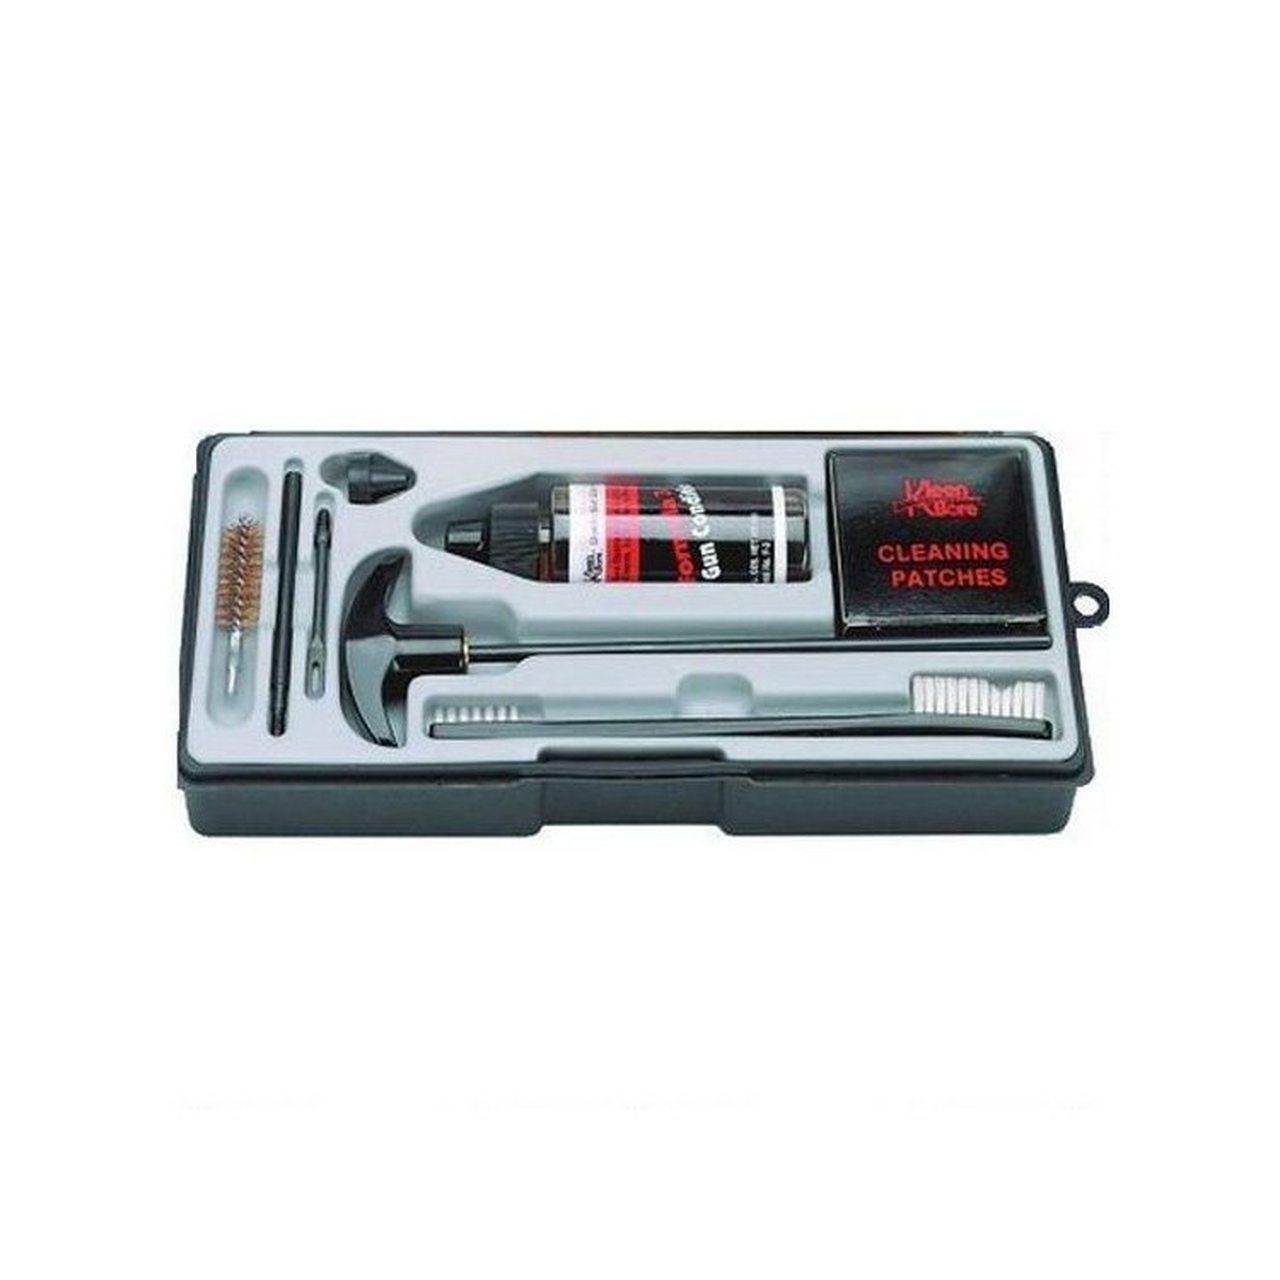 KleenBore Classic Cleaning Kit for .38/.357/9mm/.380 Handguns - PK-210-Kleenbore